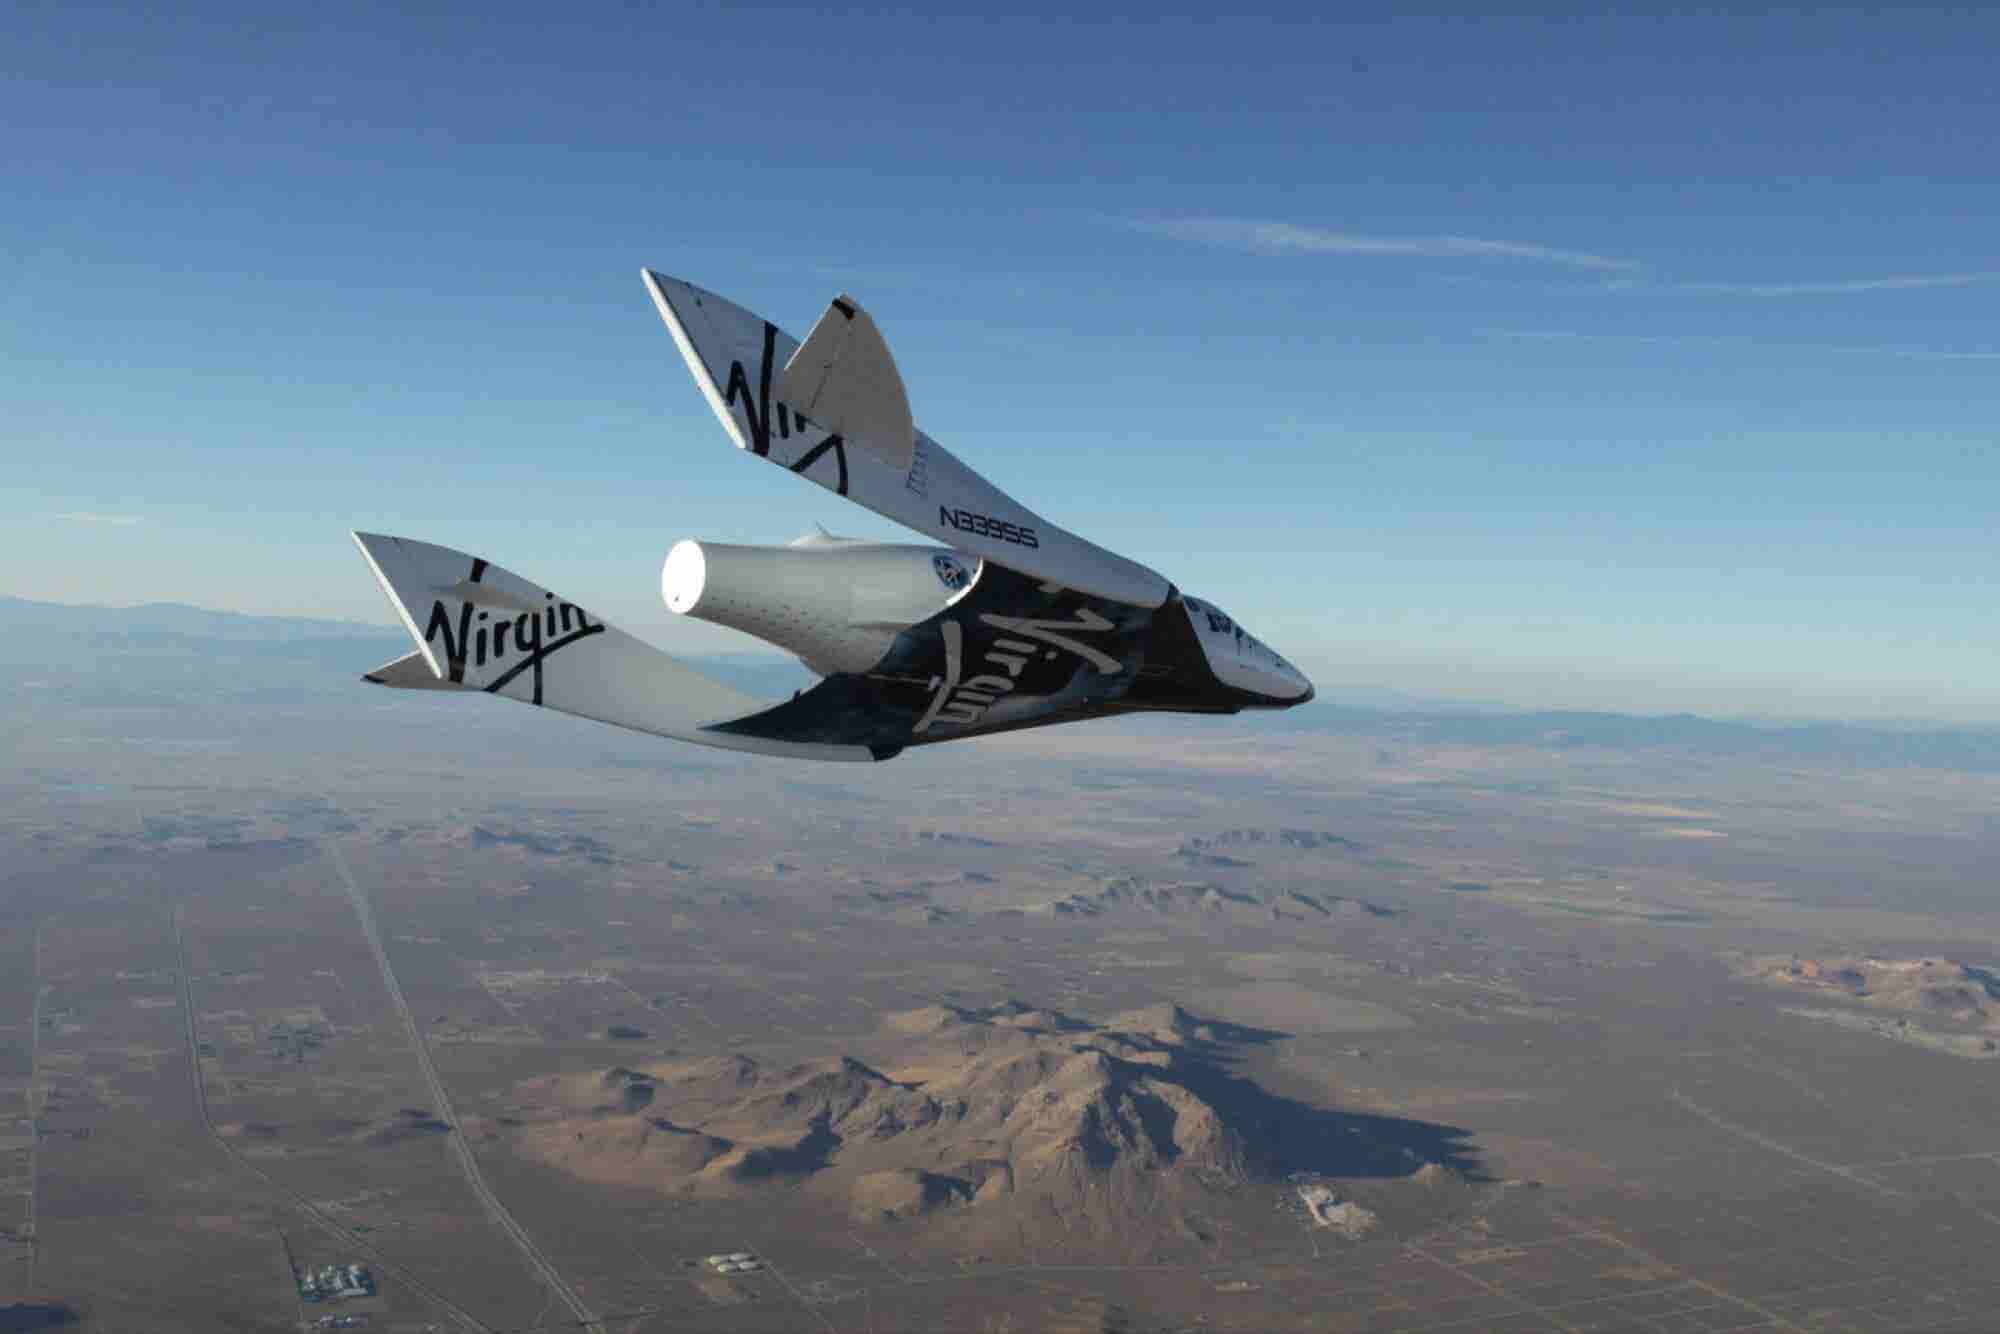 Virgin Galactic to Resume Test Flights